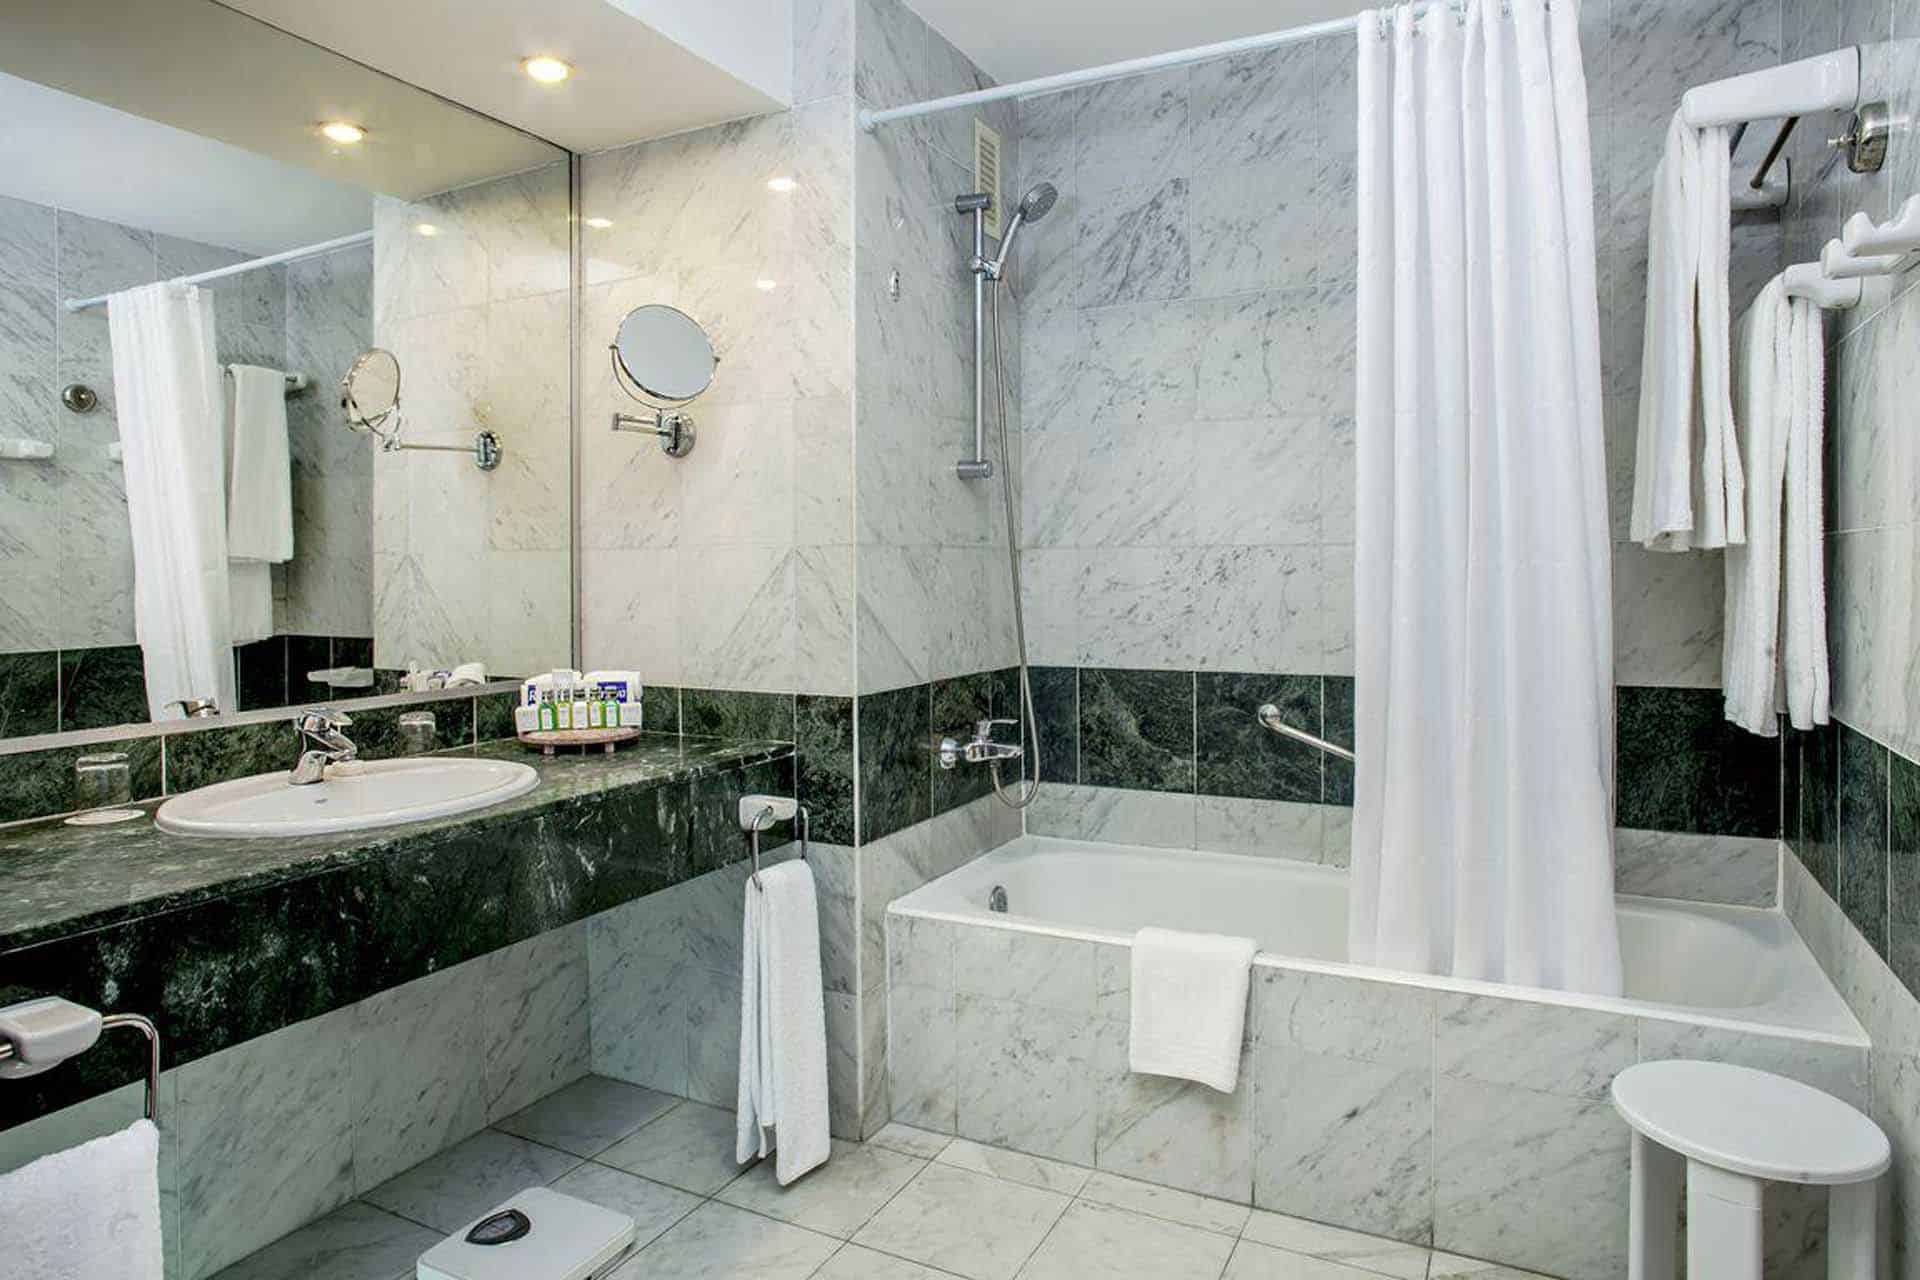 H1453 Salle de bain hotel Melia La Havane Cuba